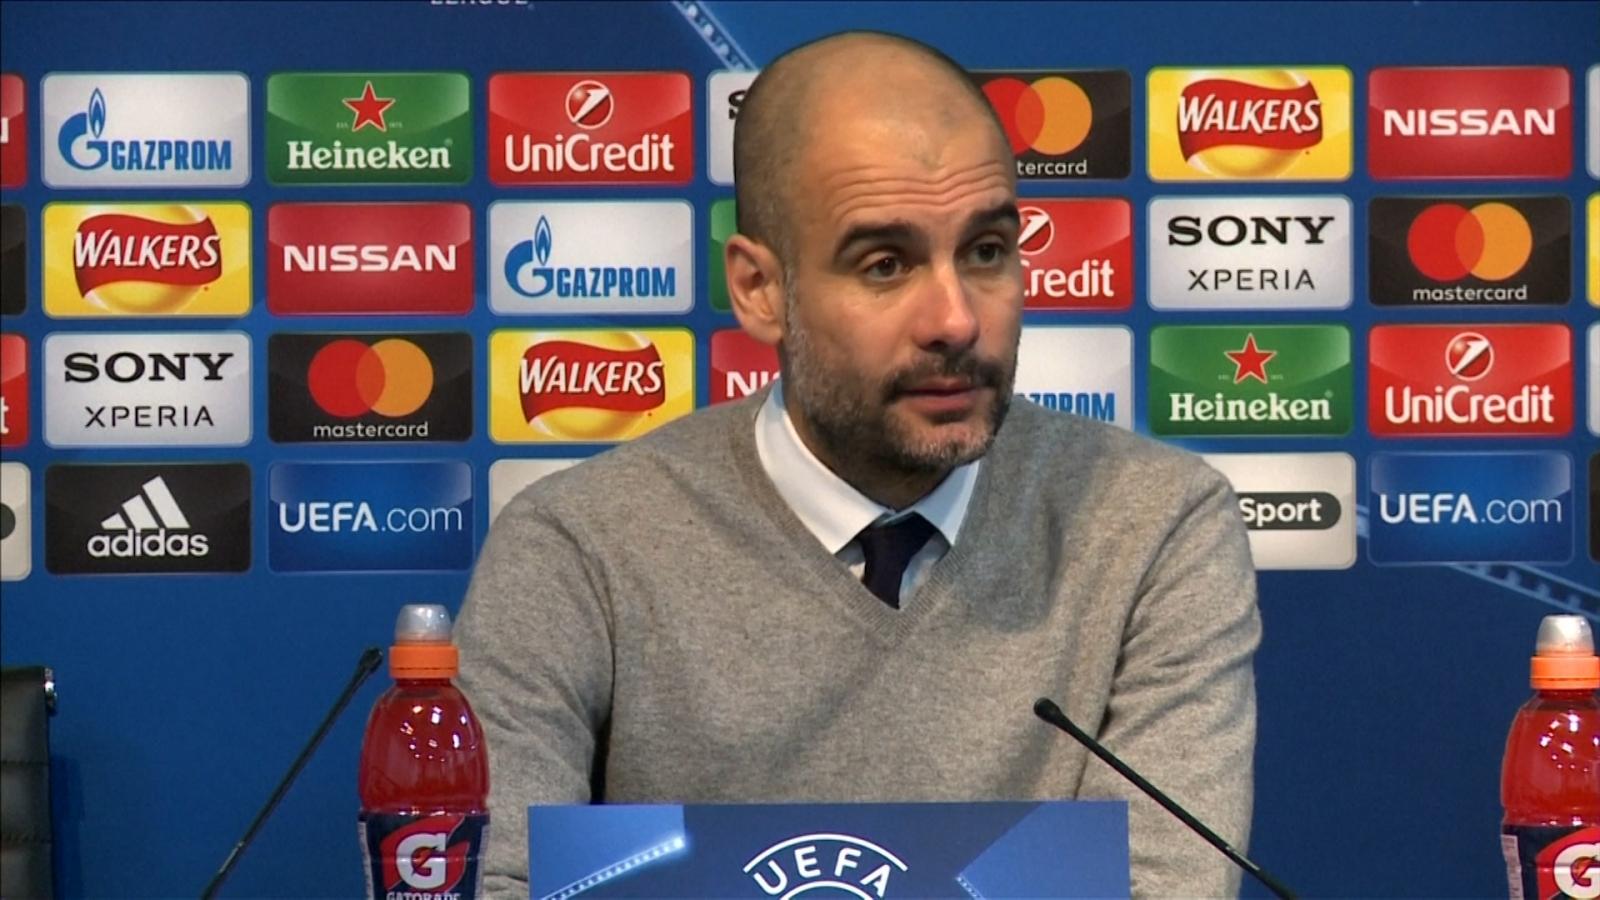 Pep Guardiola praises team after win